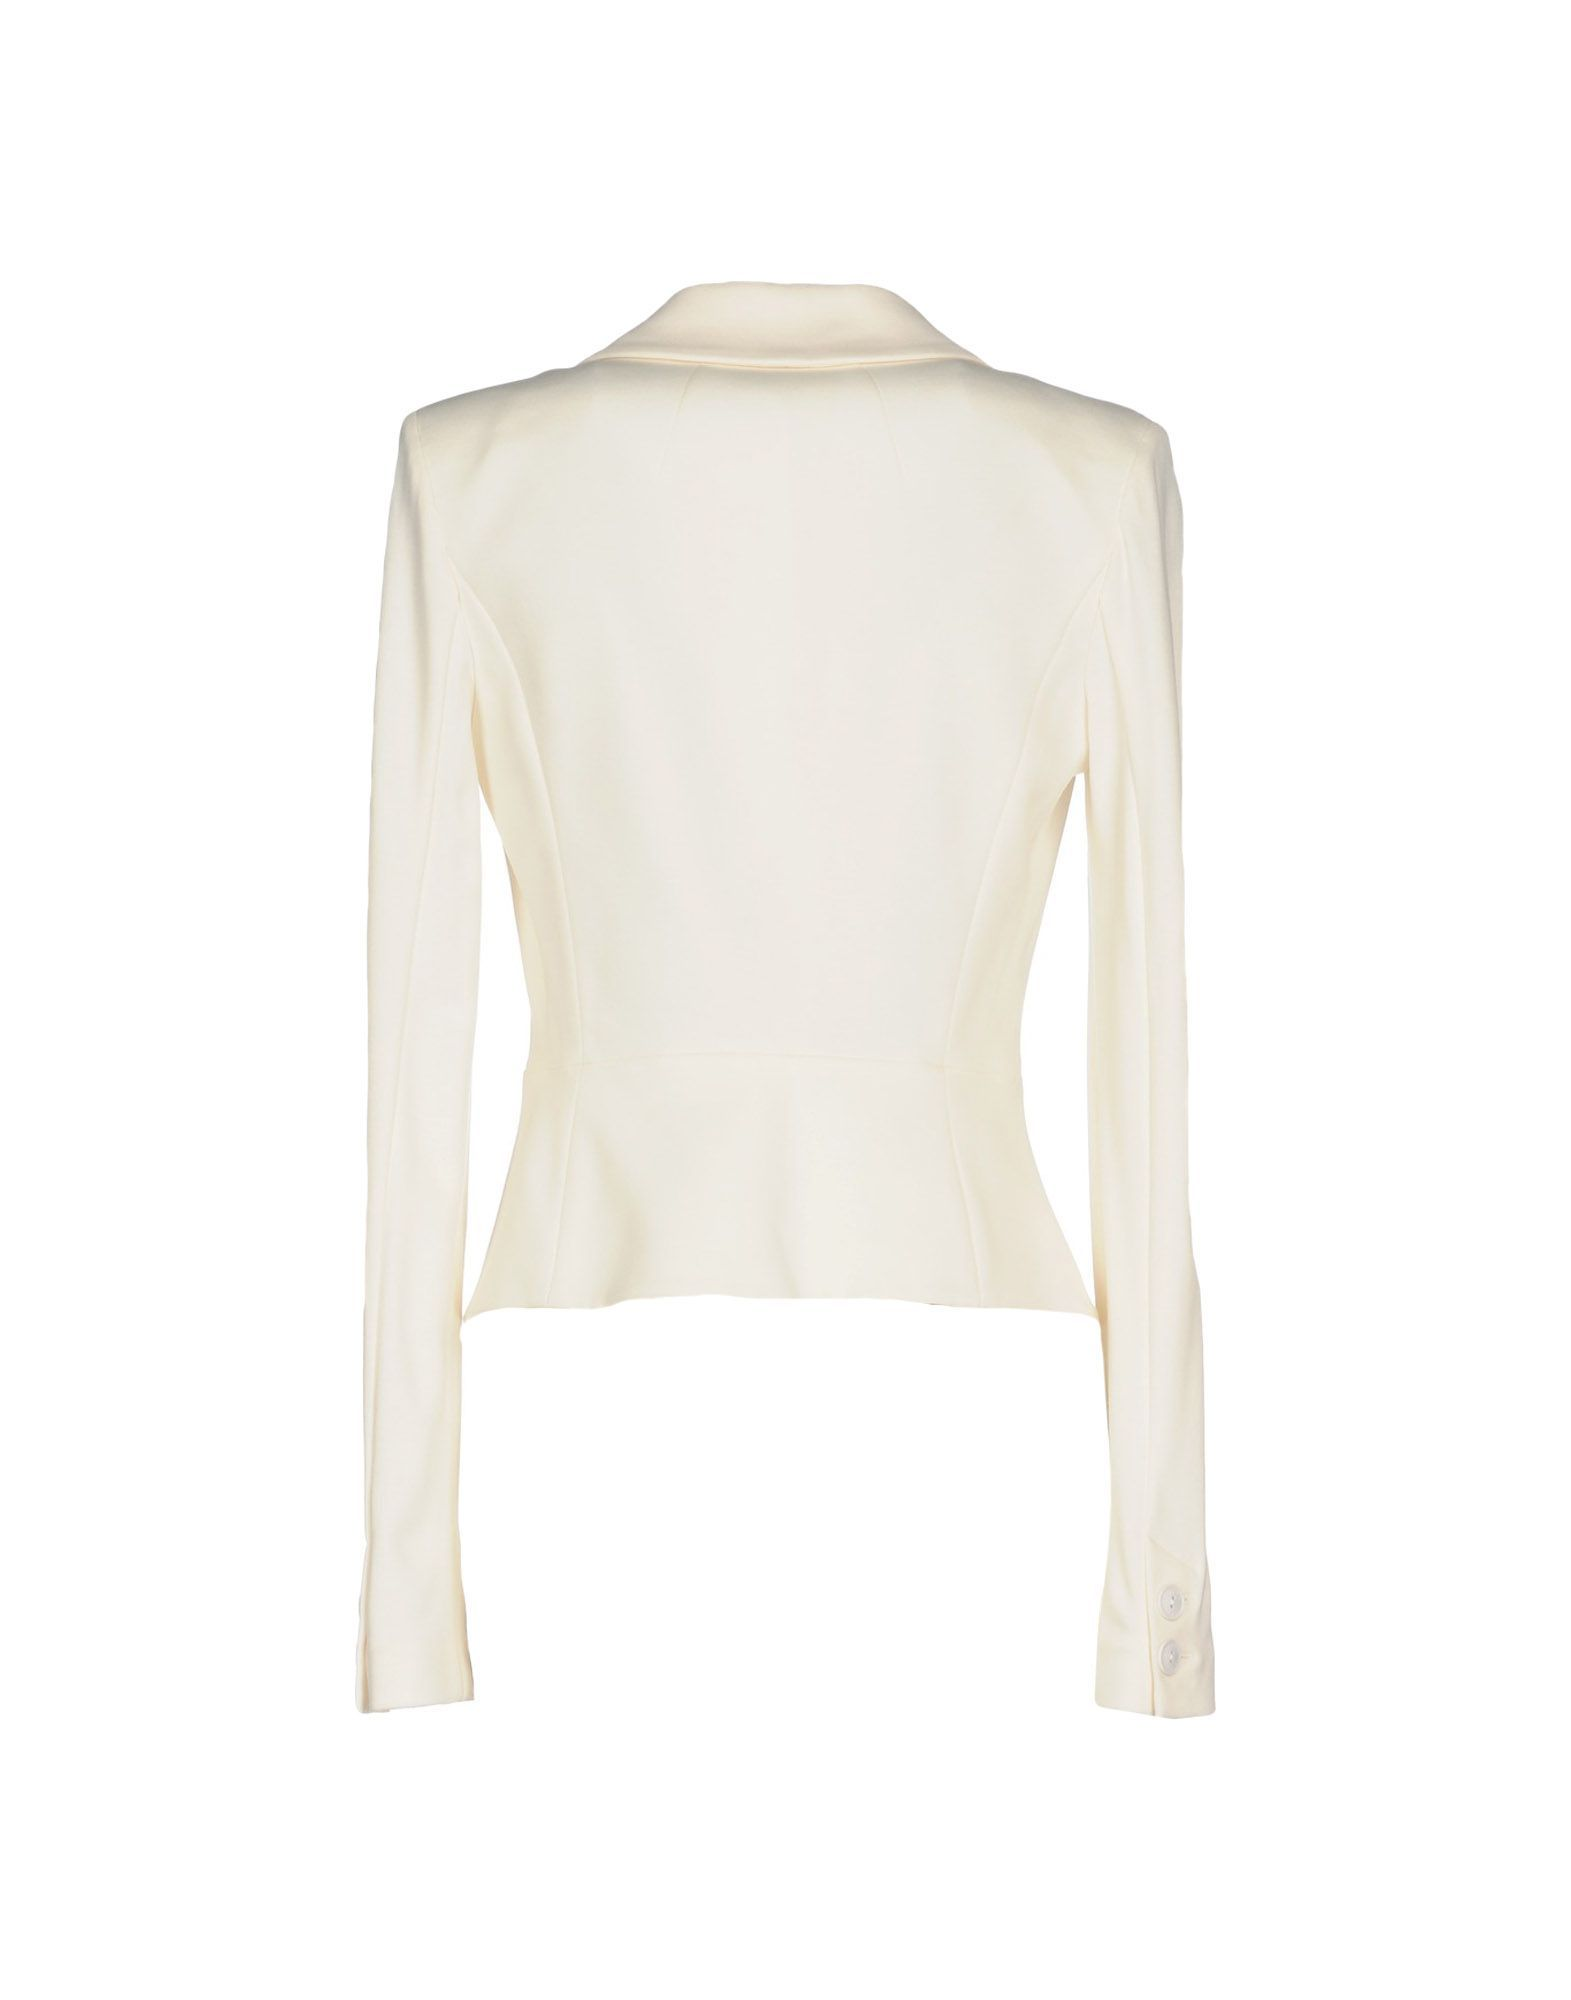 Patrizia Pepe Ivory Single Breasted Blazer